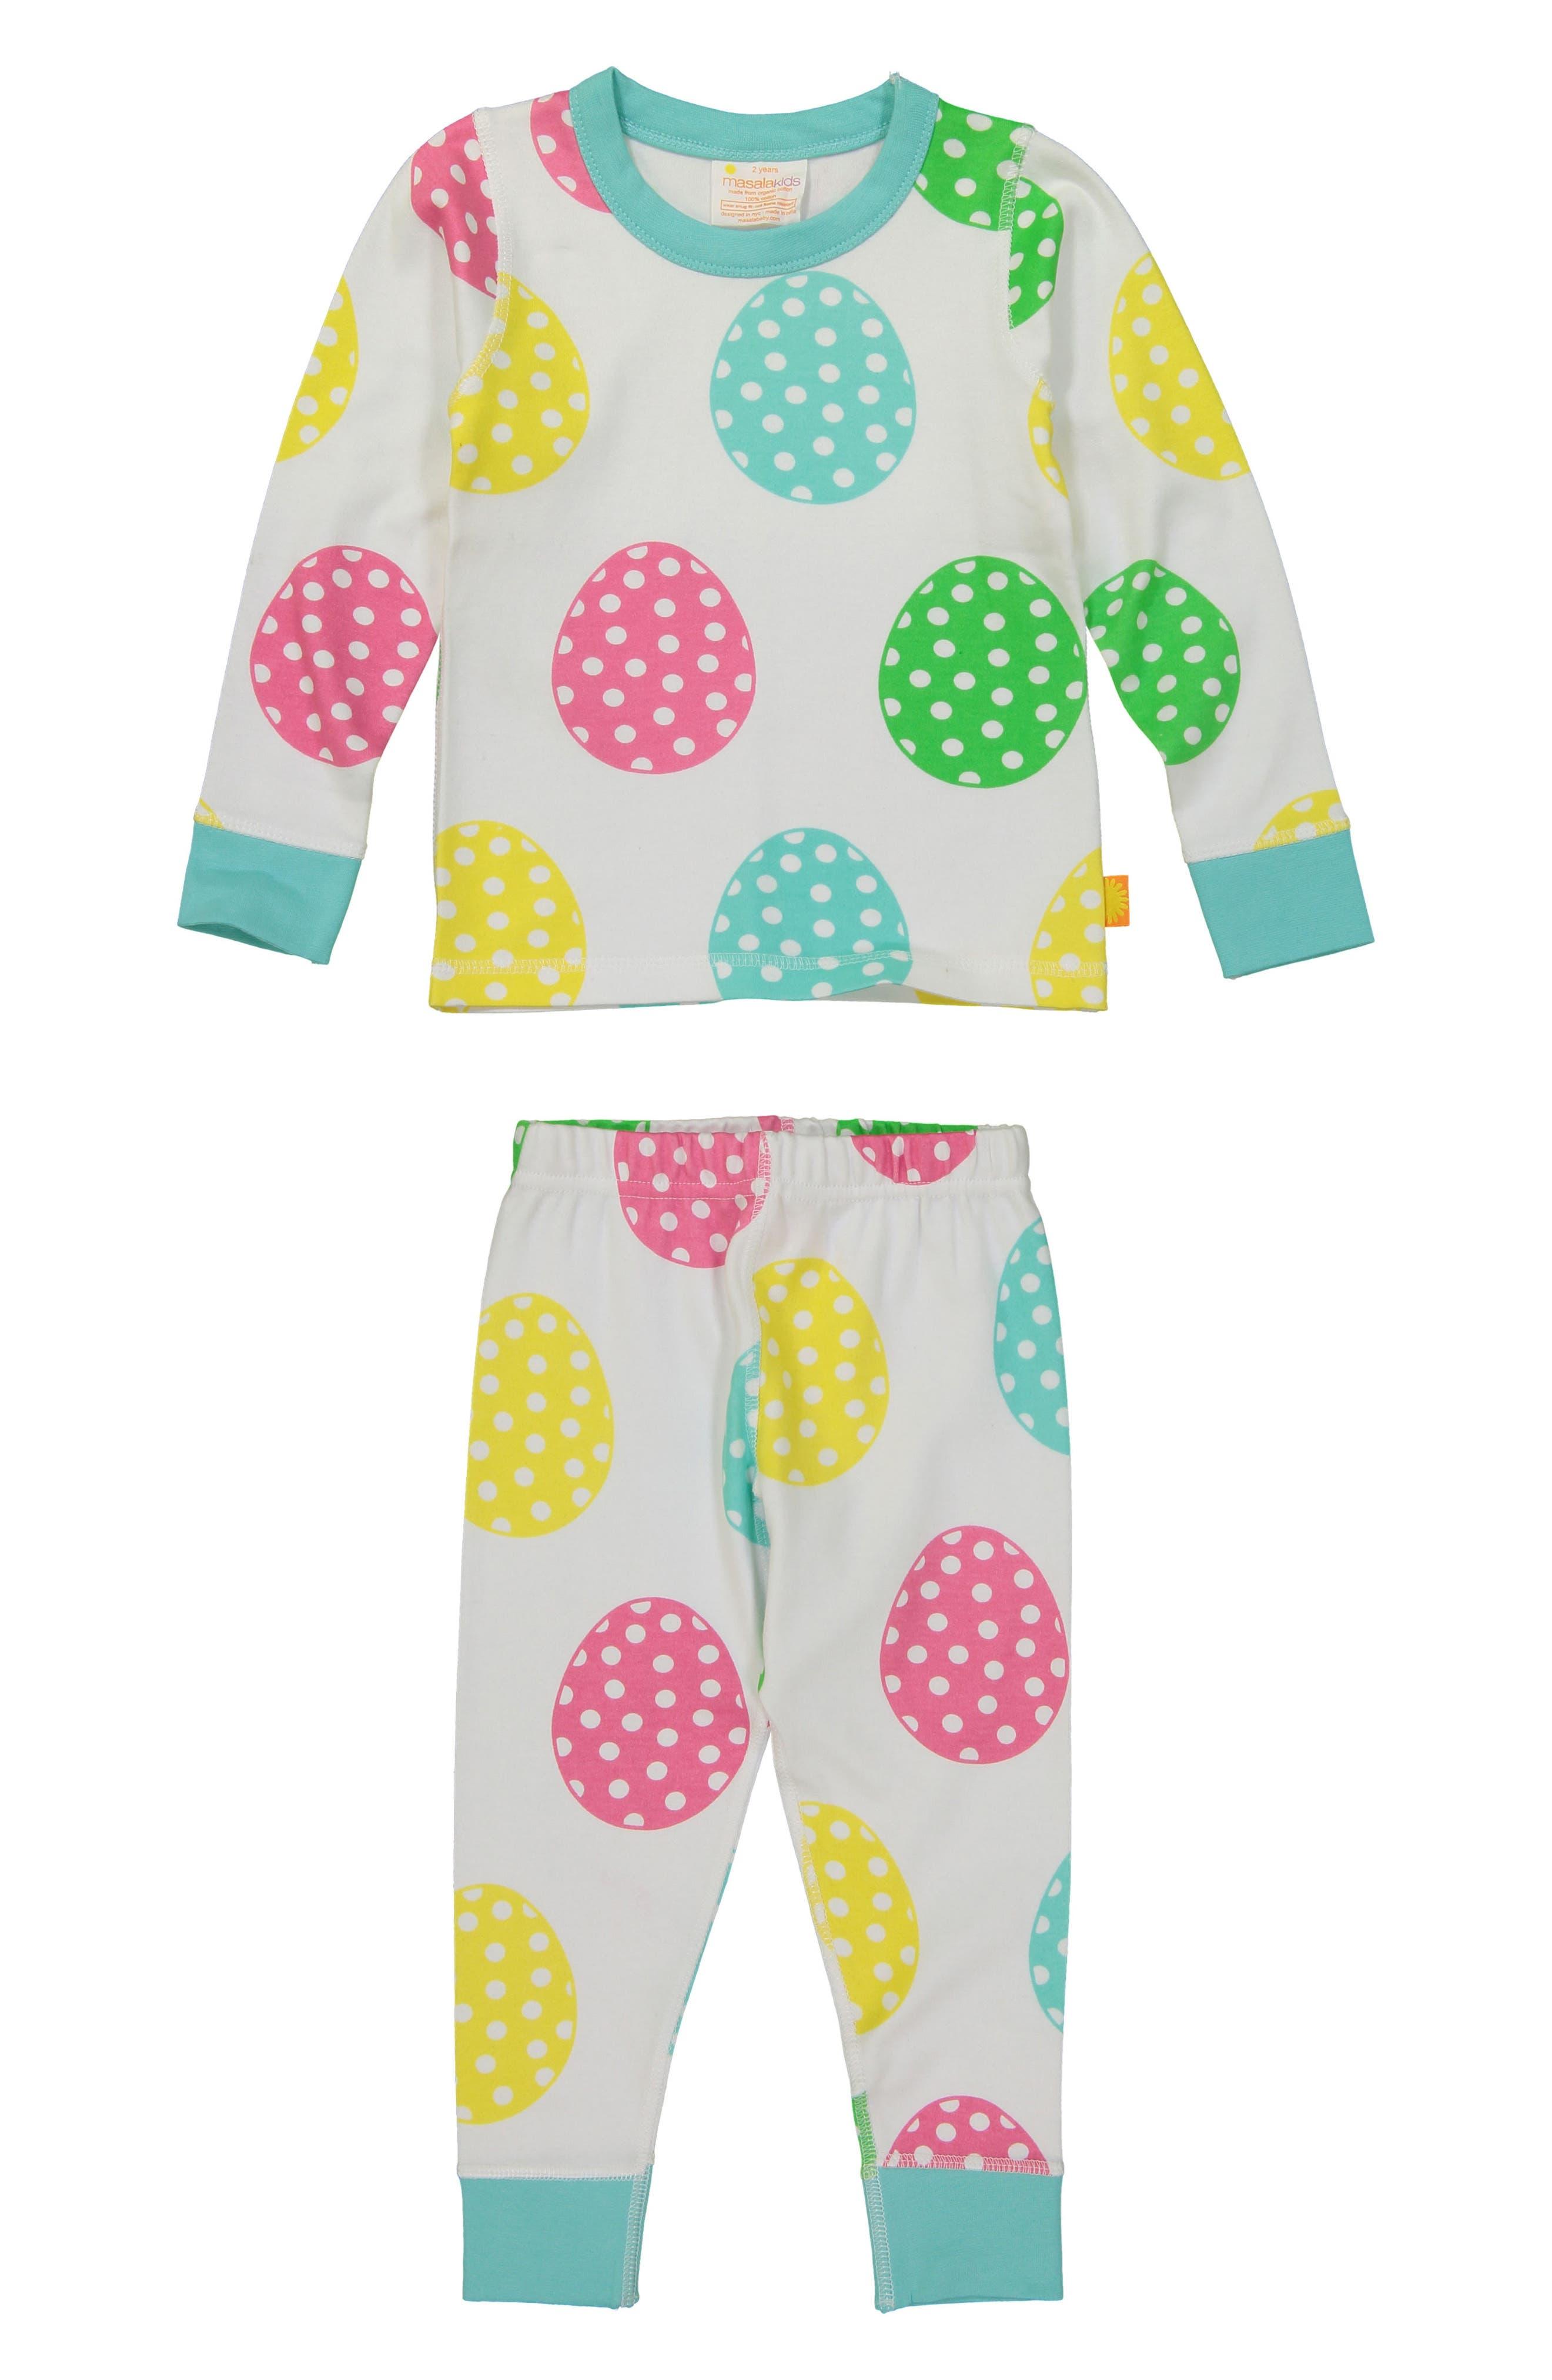 Main Image - Masala Baby Rainbow Eggs Organic Cotton Fitted Two-Piece Pajamas (Toddler Girls, Little Girls & Big Girls)